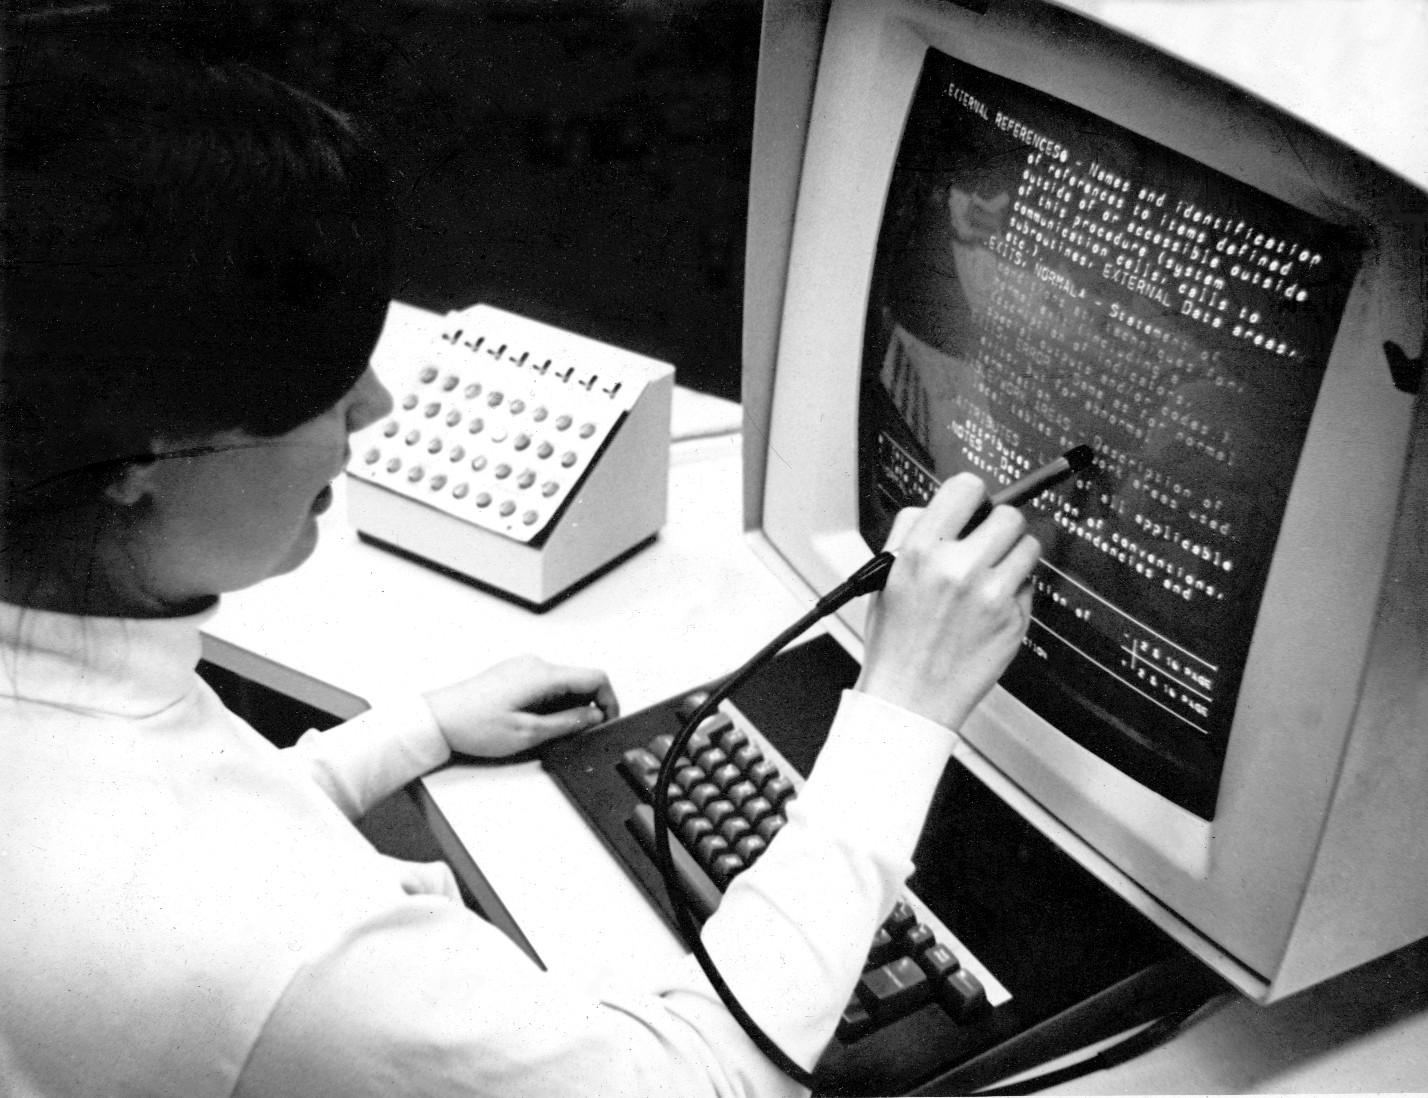 hypertexteditingsystemconsolebrownuniv1969.jpg